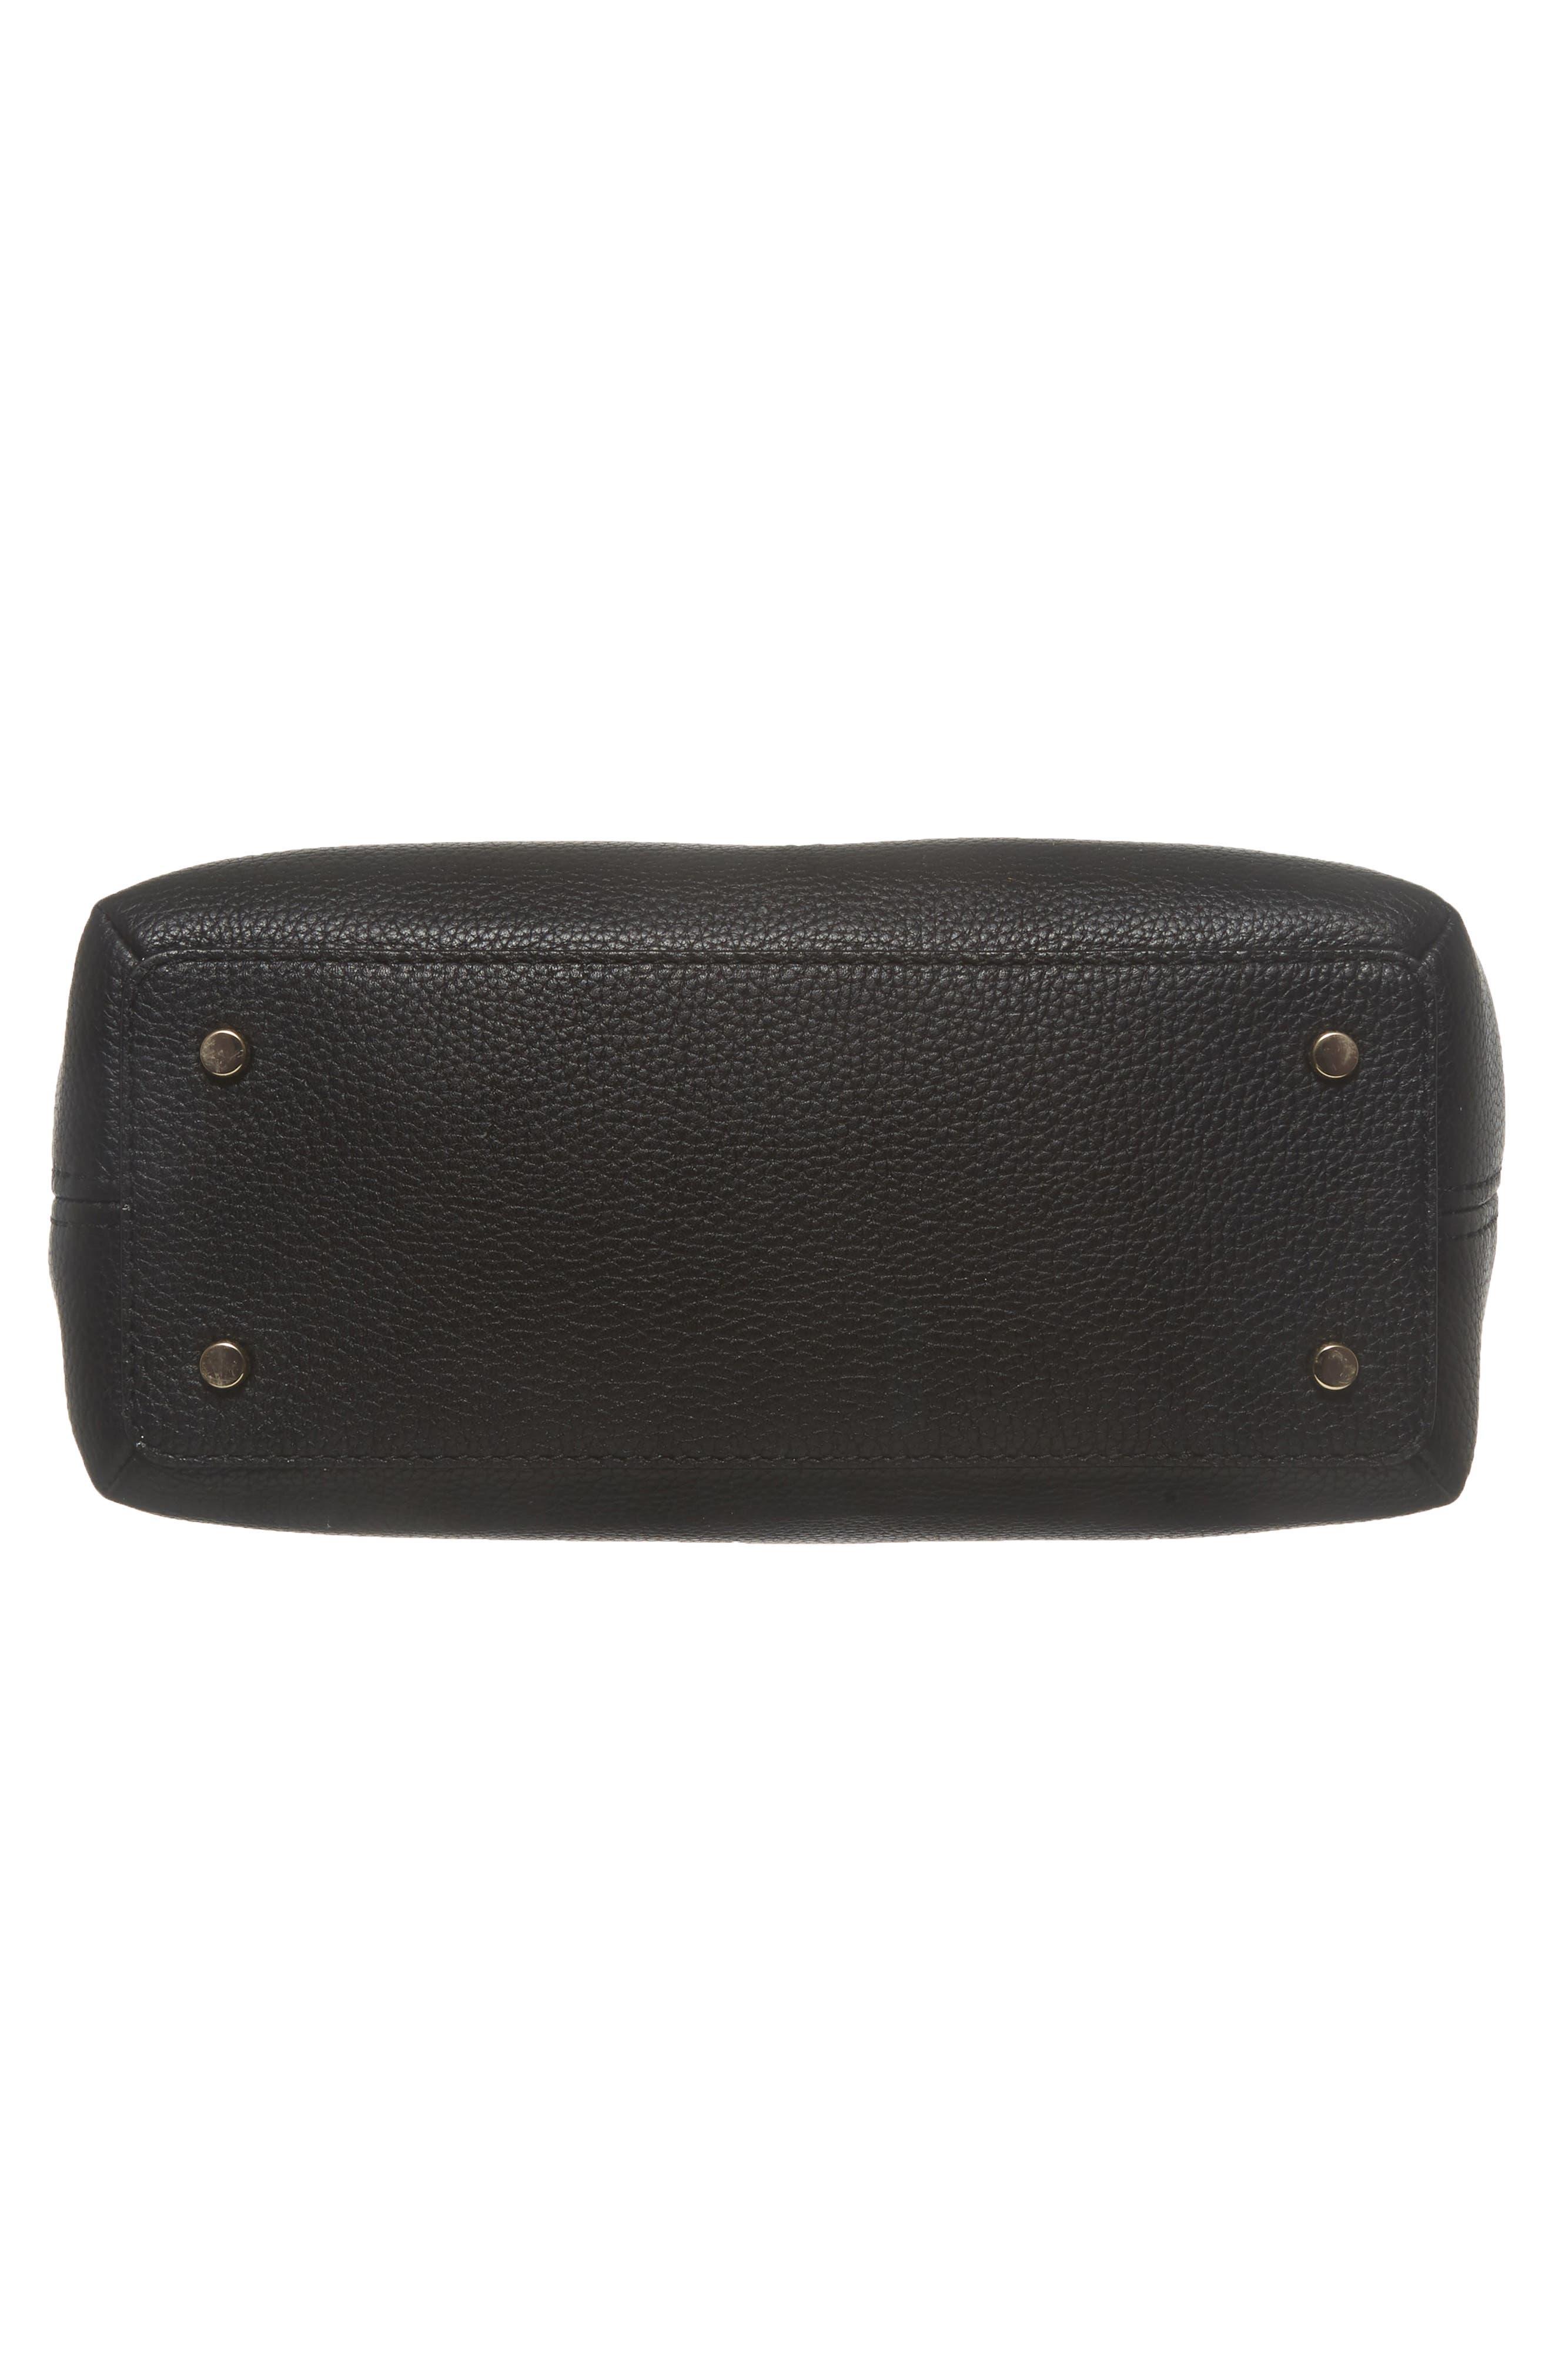 jackson street – small octavia leather satchel,                             Alternate thumbnail 6, color,                             001